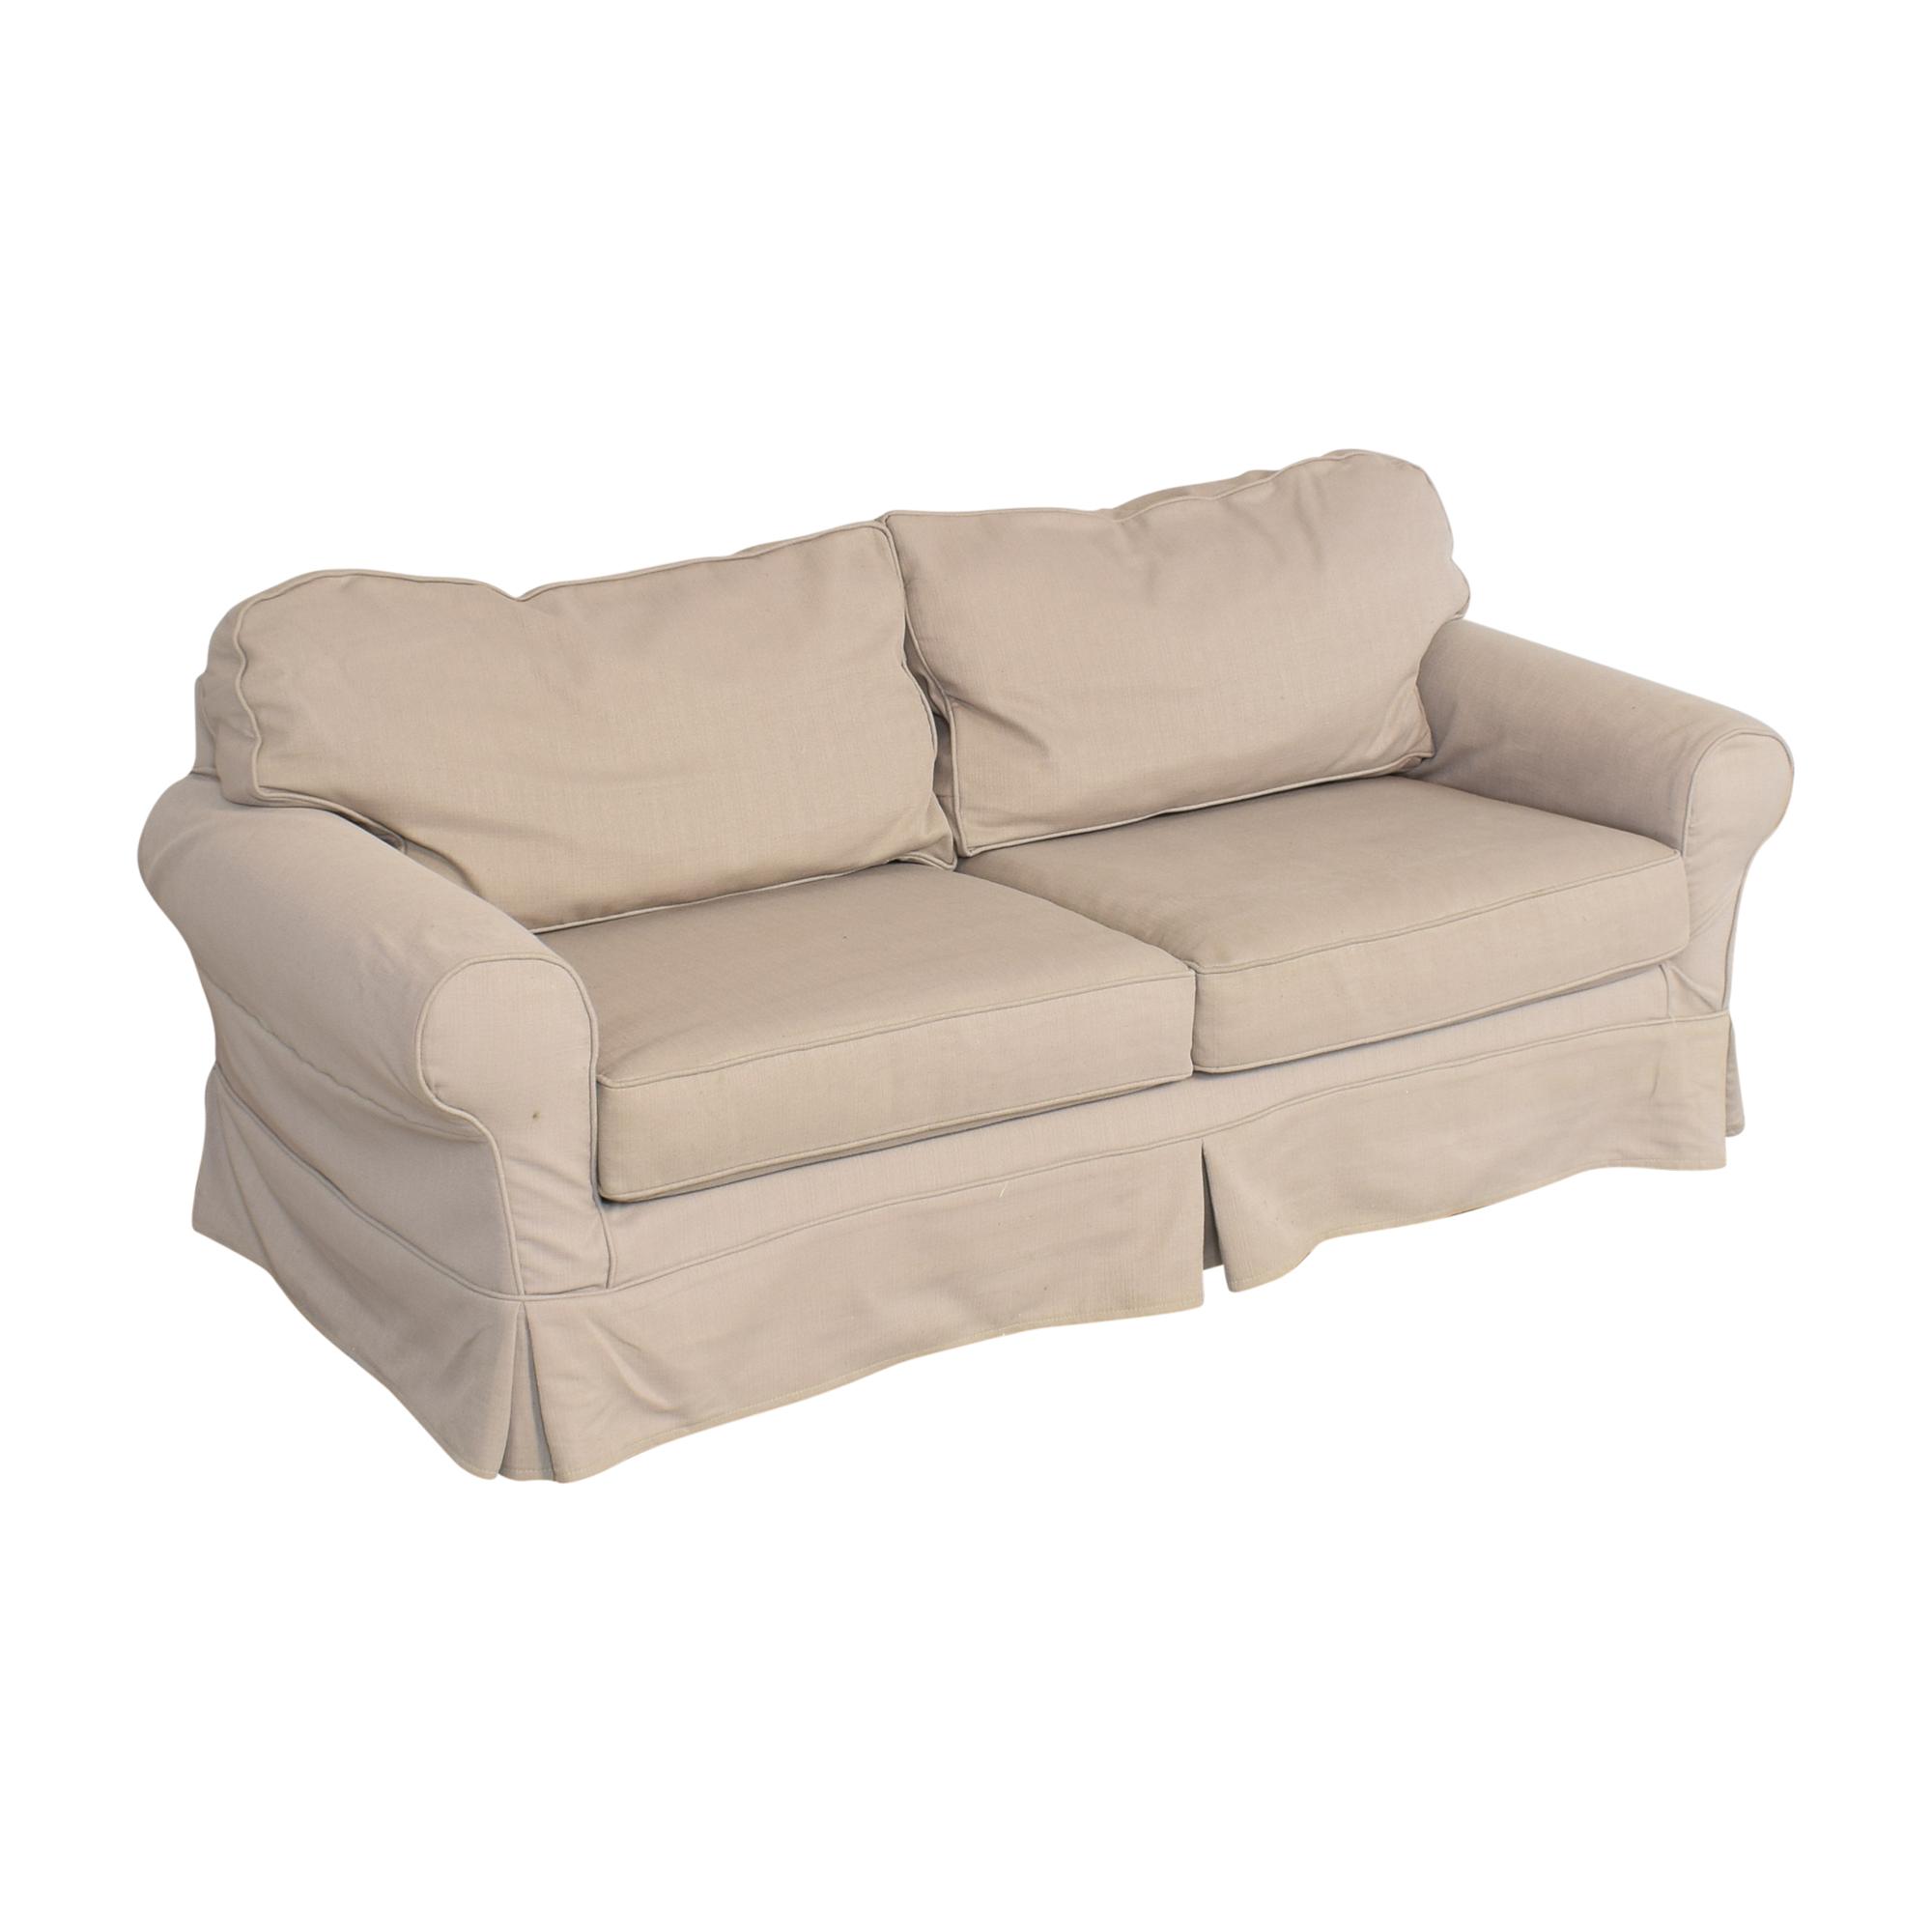 Mitchell Gold + Bob Williams Mitchell Gold + Bob Williams Slipcover Sofa used